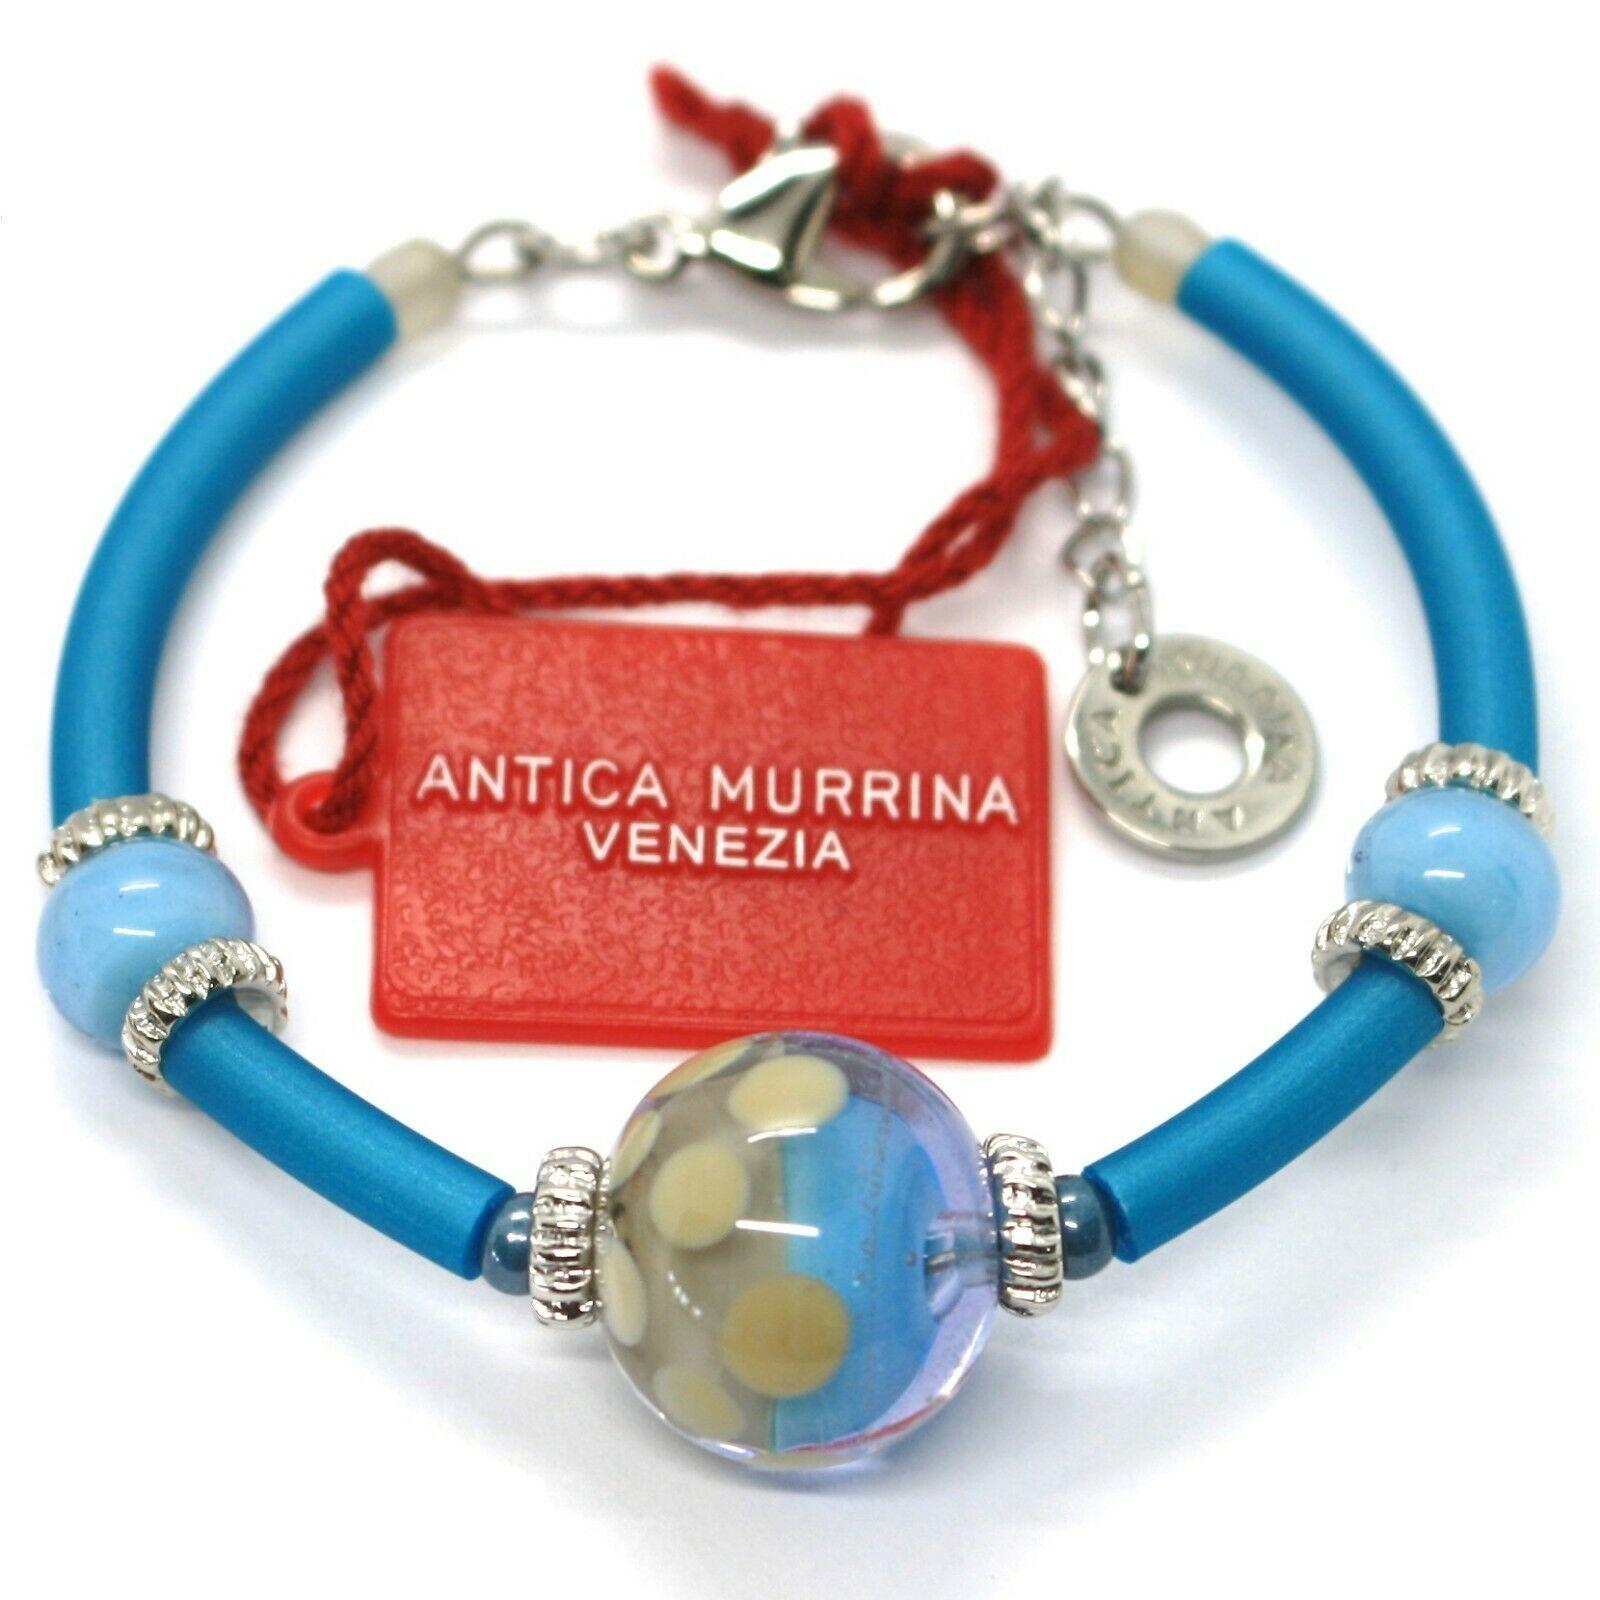 Bracelet Antica Murrina Venezia, BR718A07, Light Blue, Sphere Polka dot, Sized